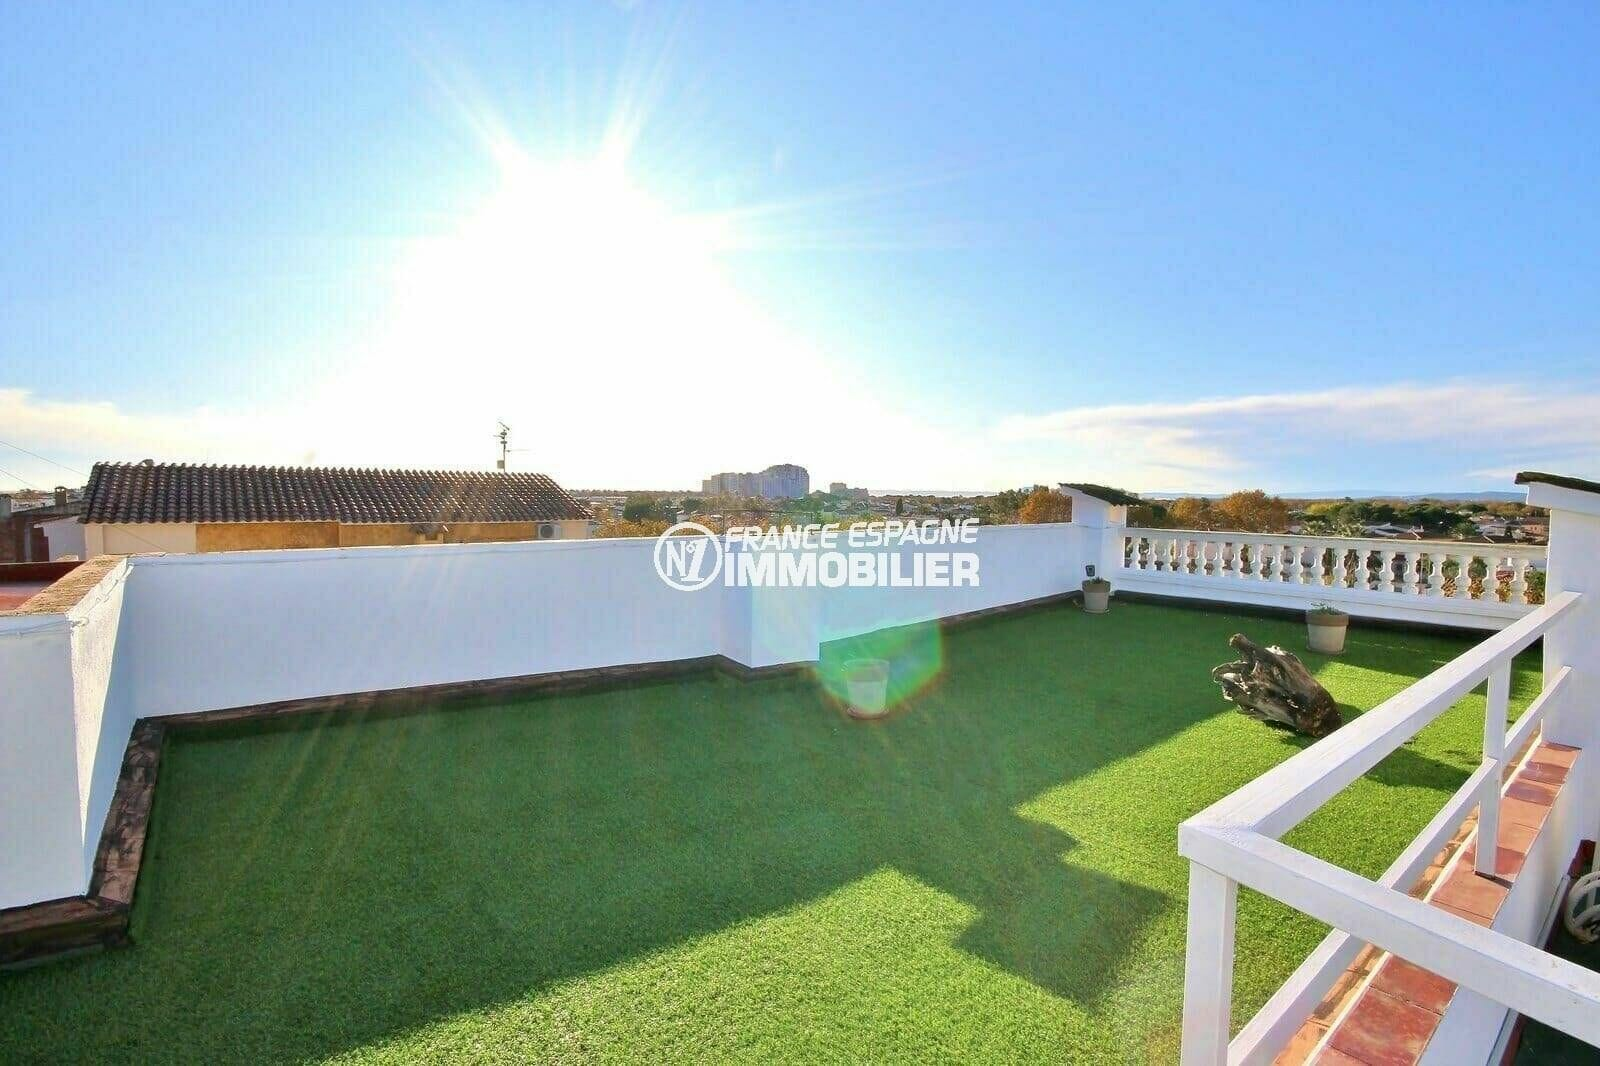 immo empuriabrava: appartement 108 m², terrasse solarium vue mer avec gazon synthétique